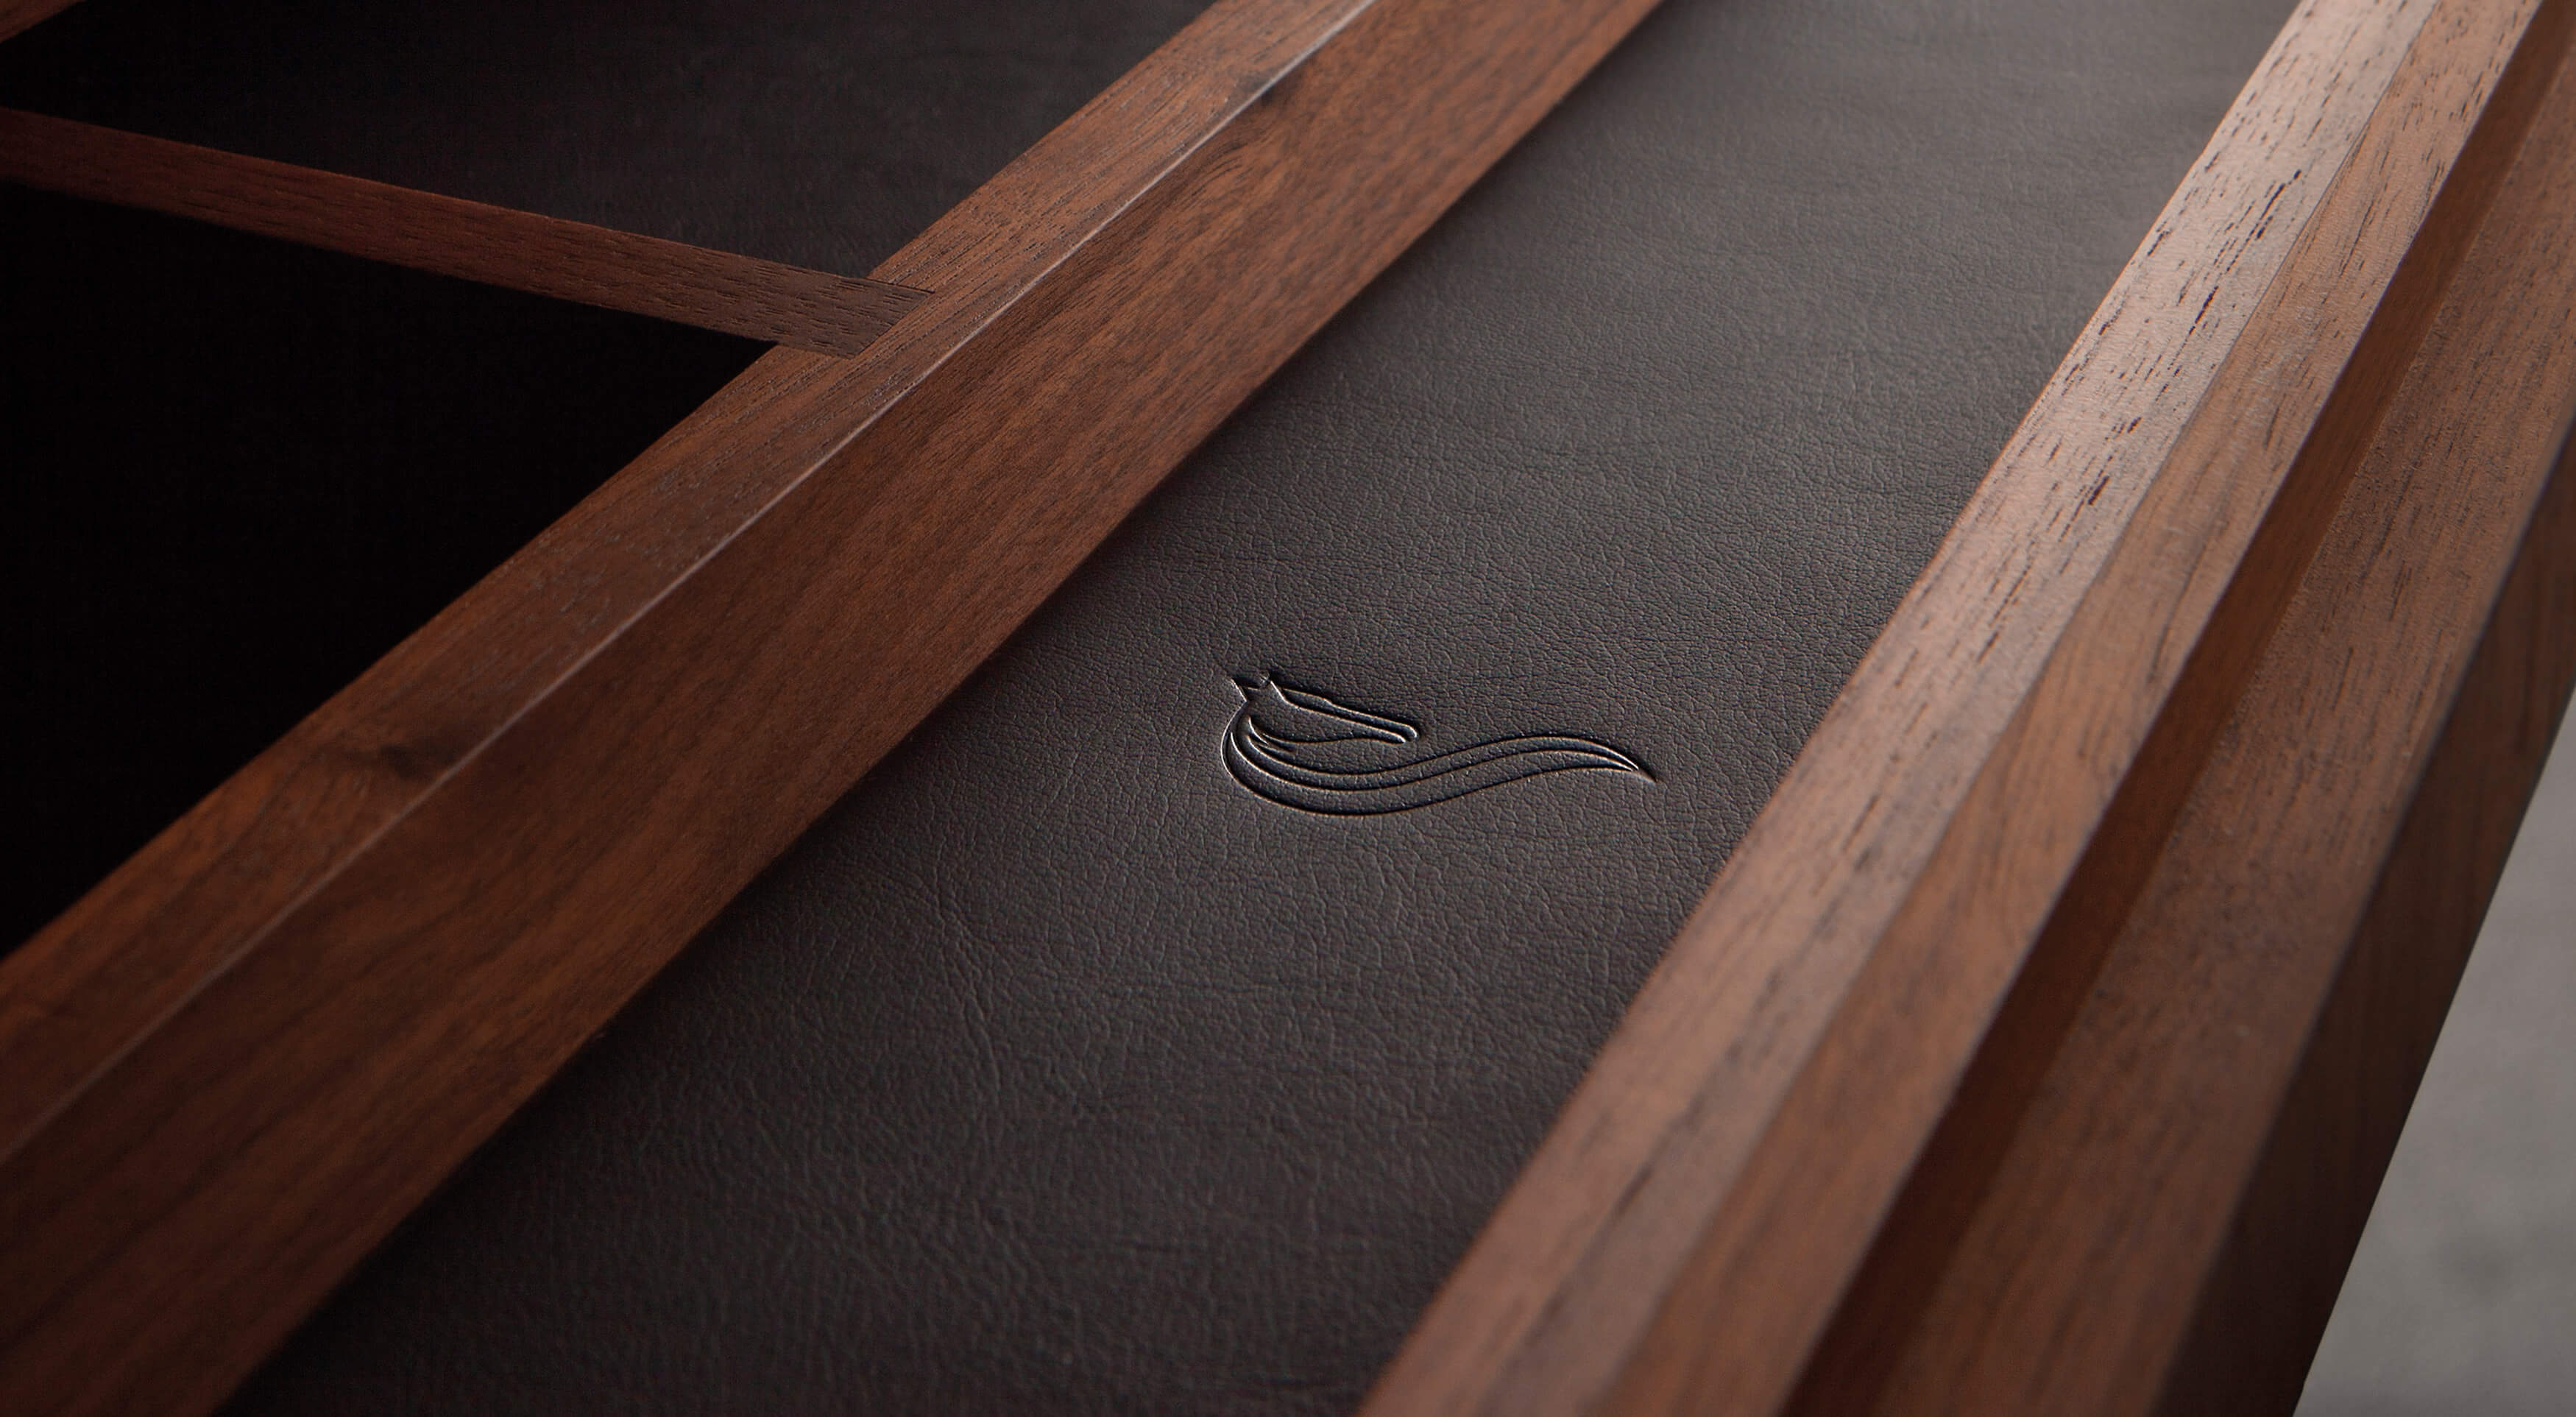 Smallbone, Bespoke Luxury Furniture Design